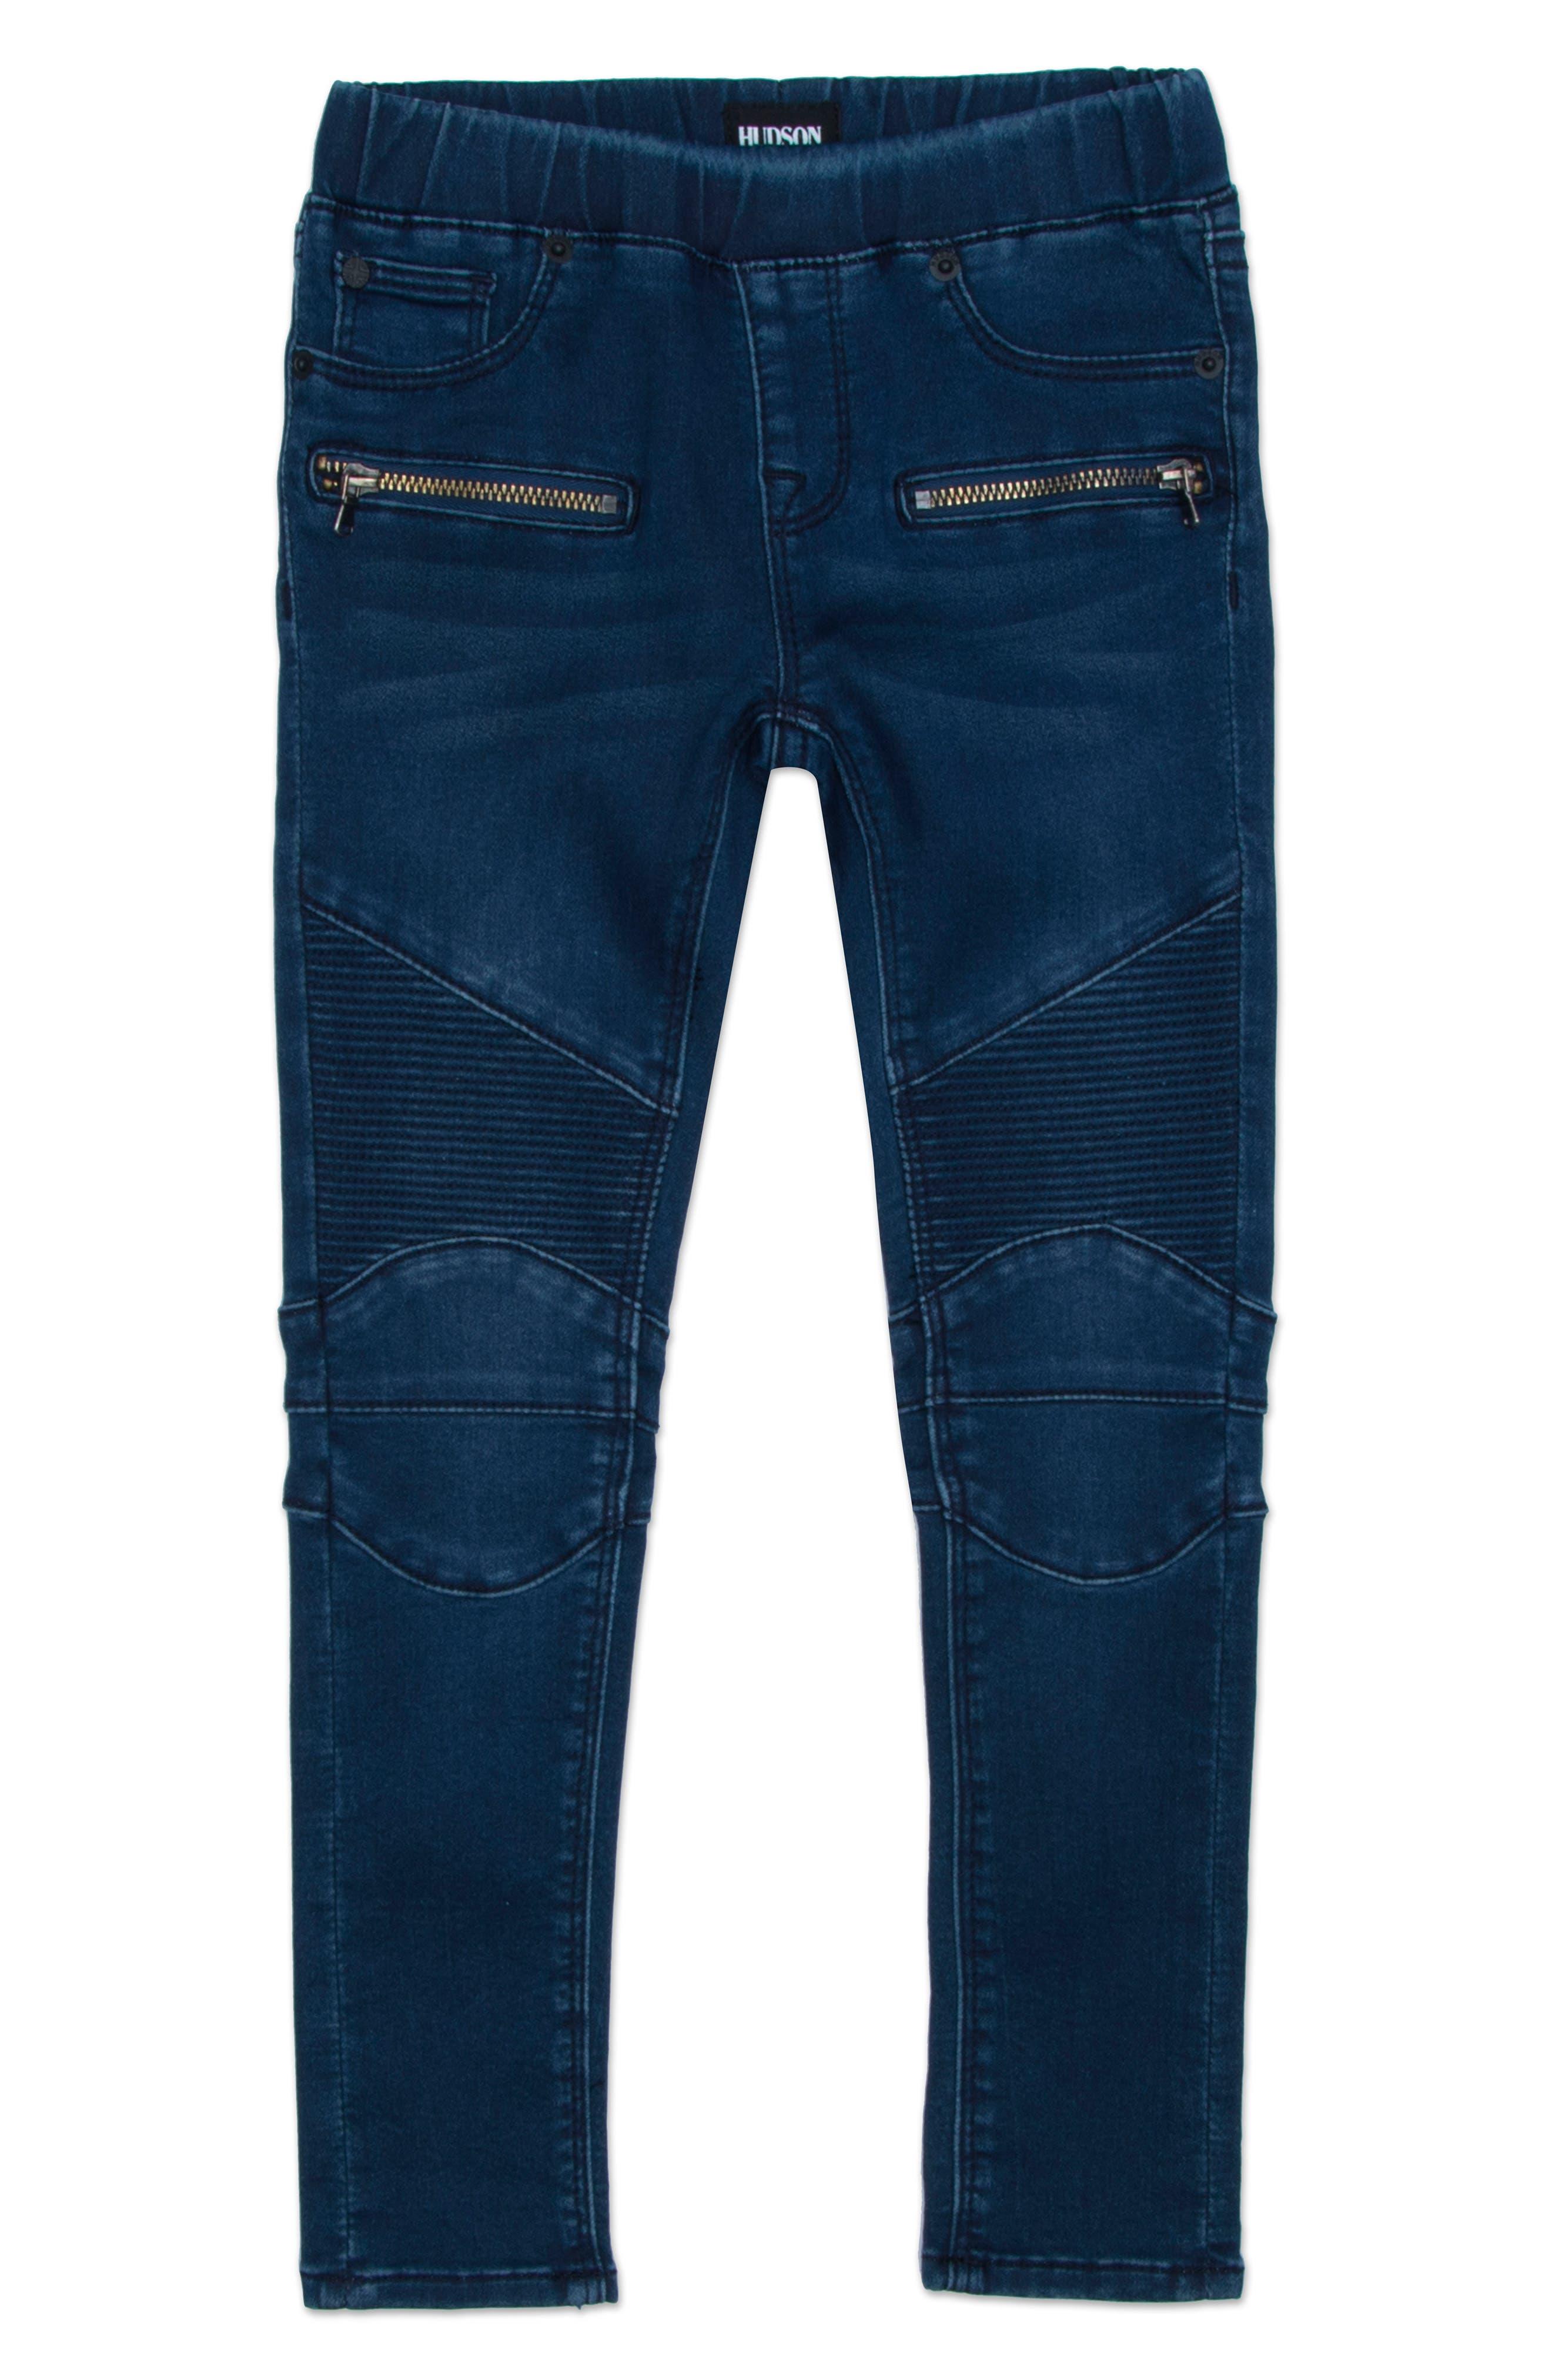 Moto Skinny Jeans,                         Main,                         color, Nile